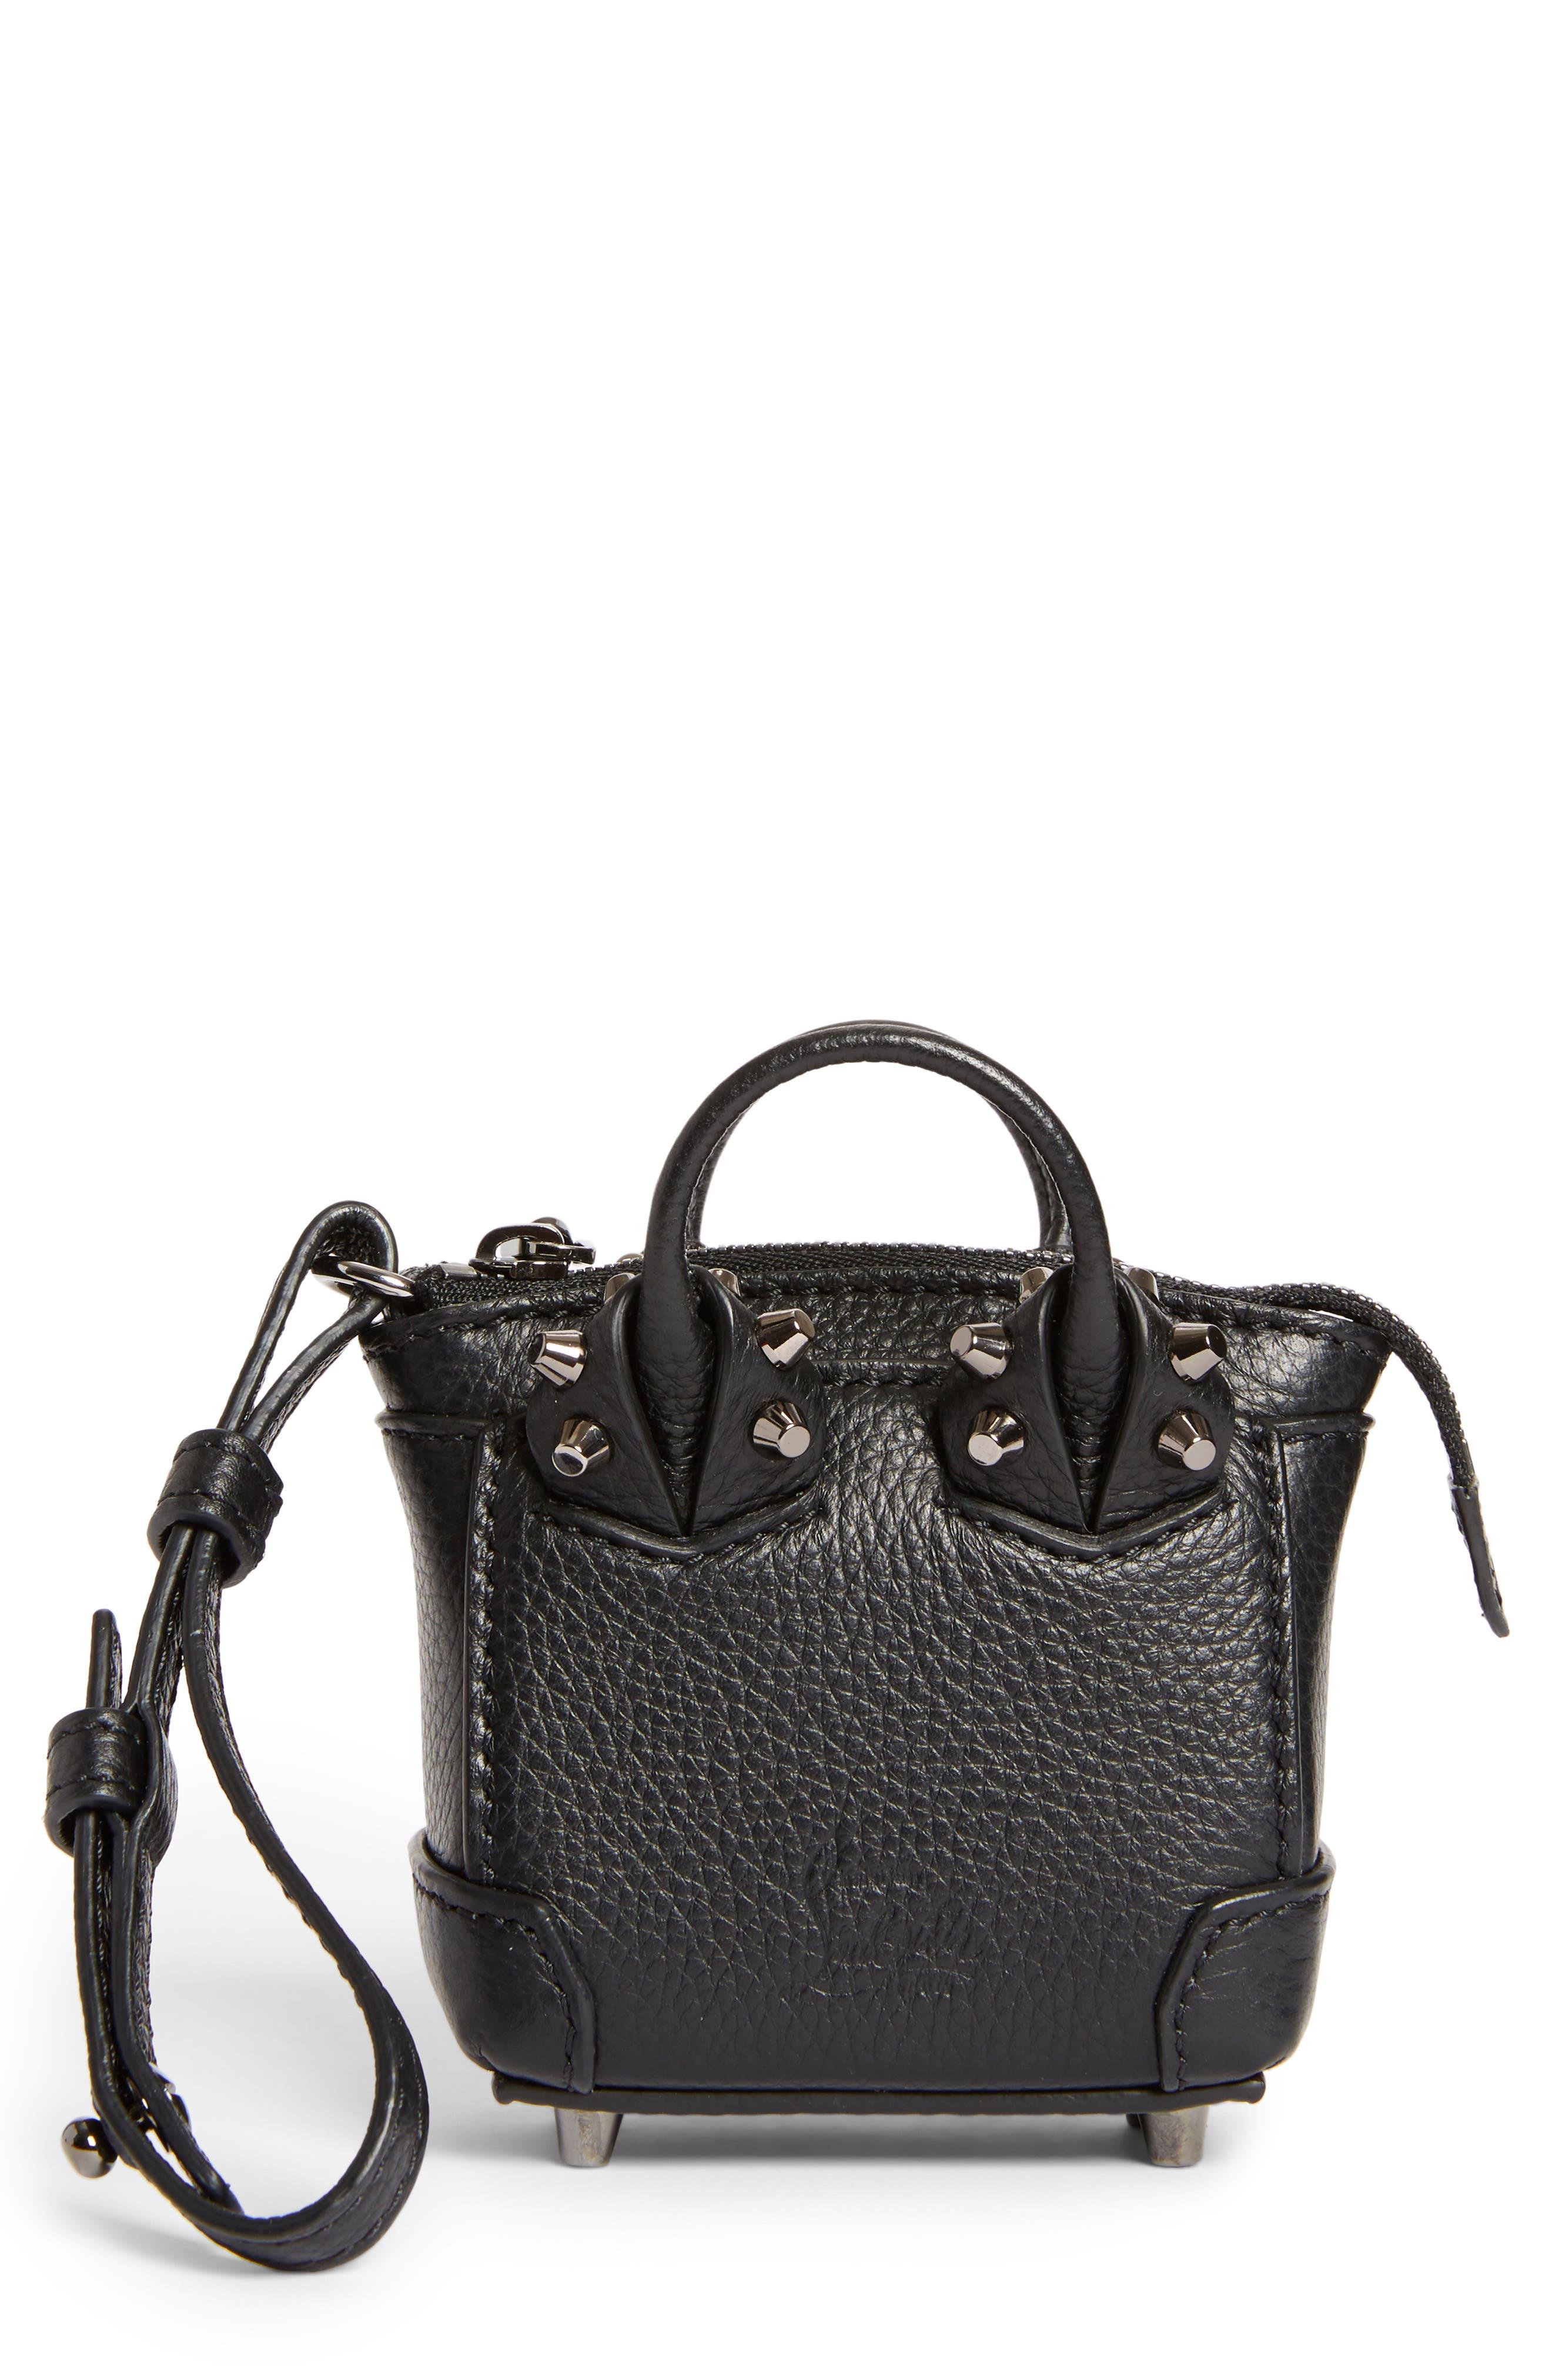 Christian Louboutin Eloise Mini Leather Bag Charm